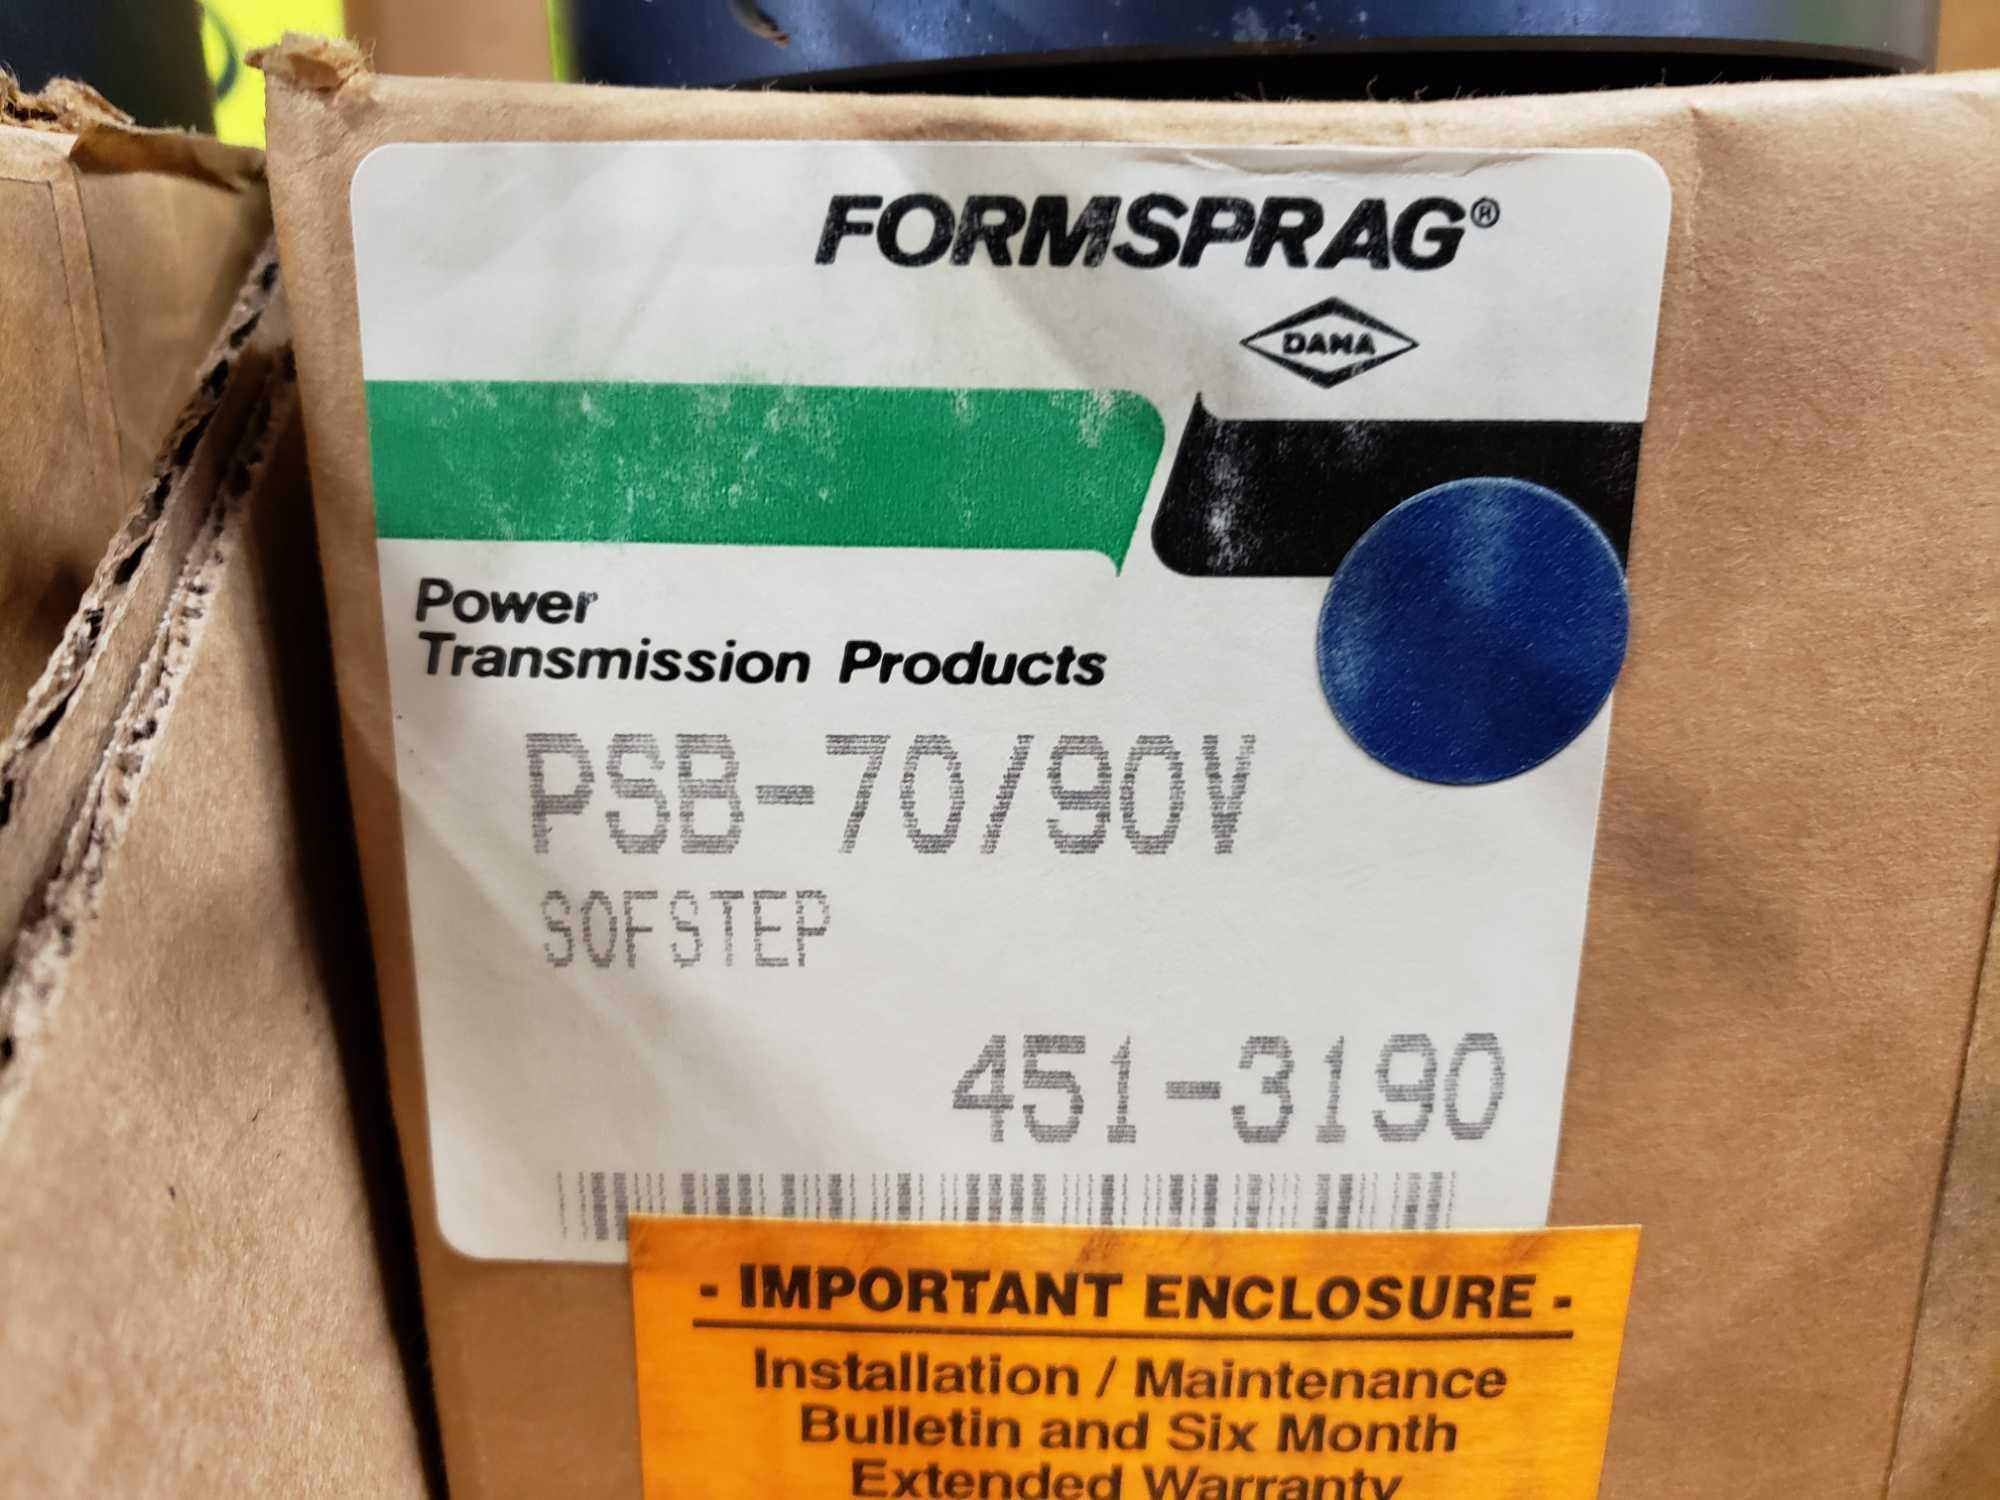 Formsprag Magpowr sofstep model PSB-70/90V magnetic partical clutch brake. New in box. - Image 4 of 4